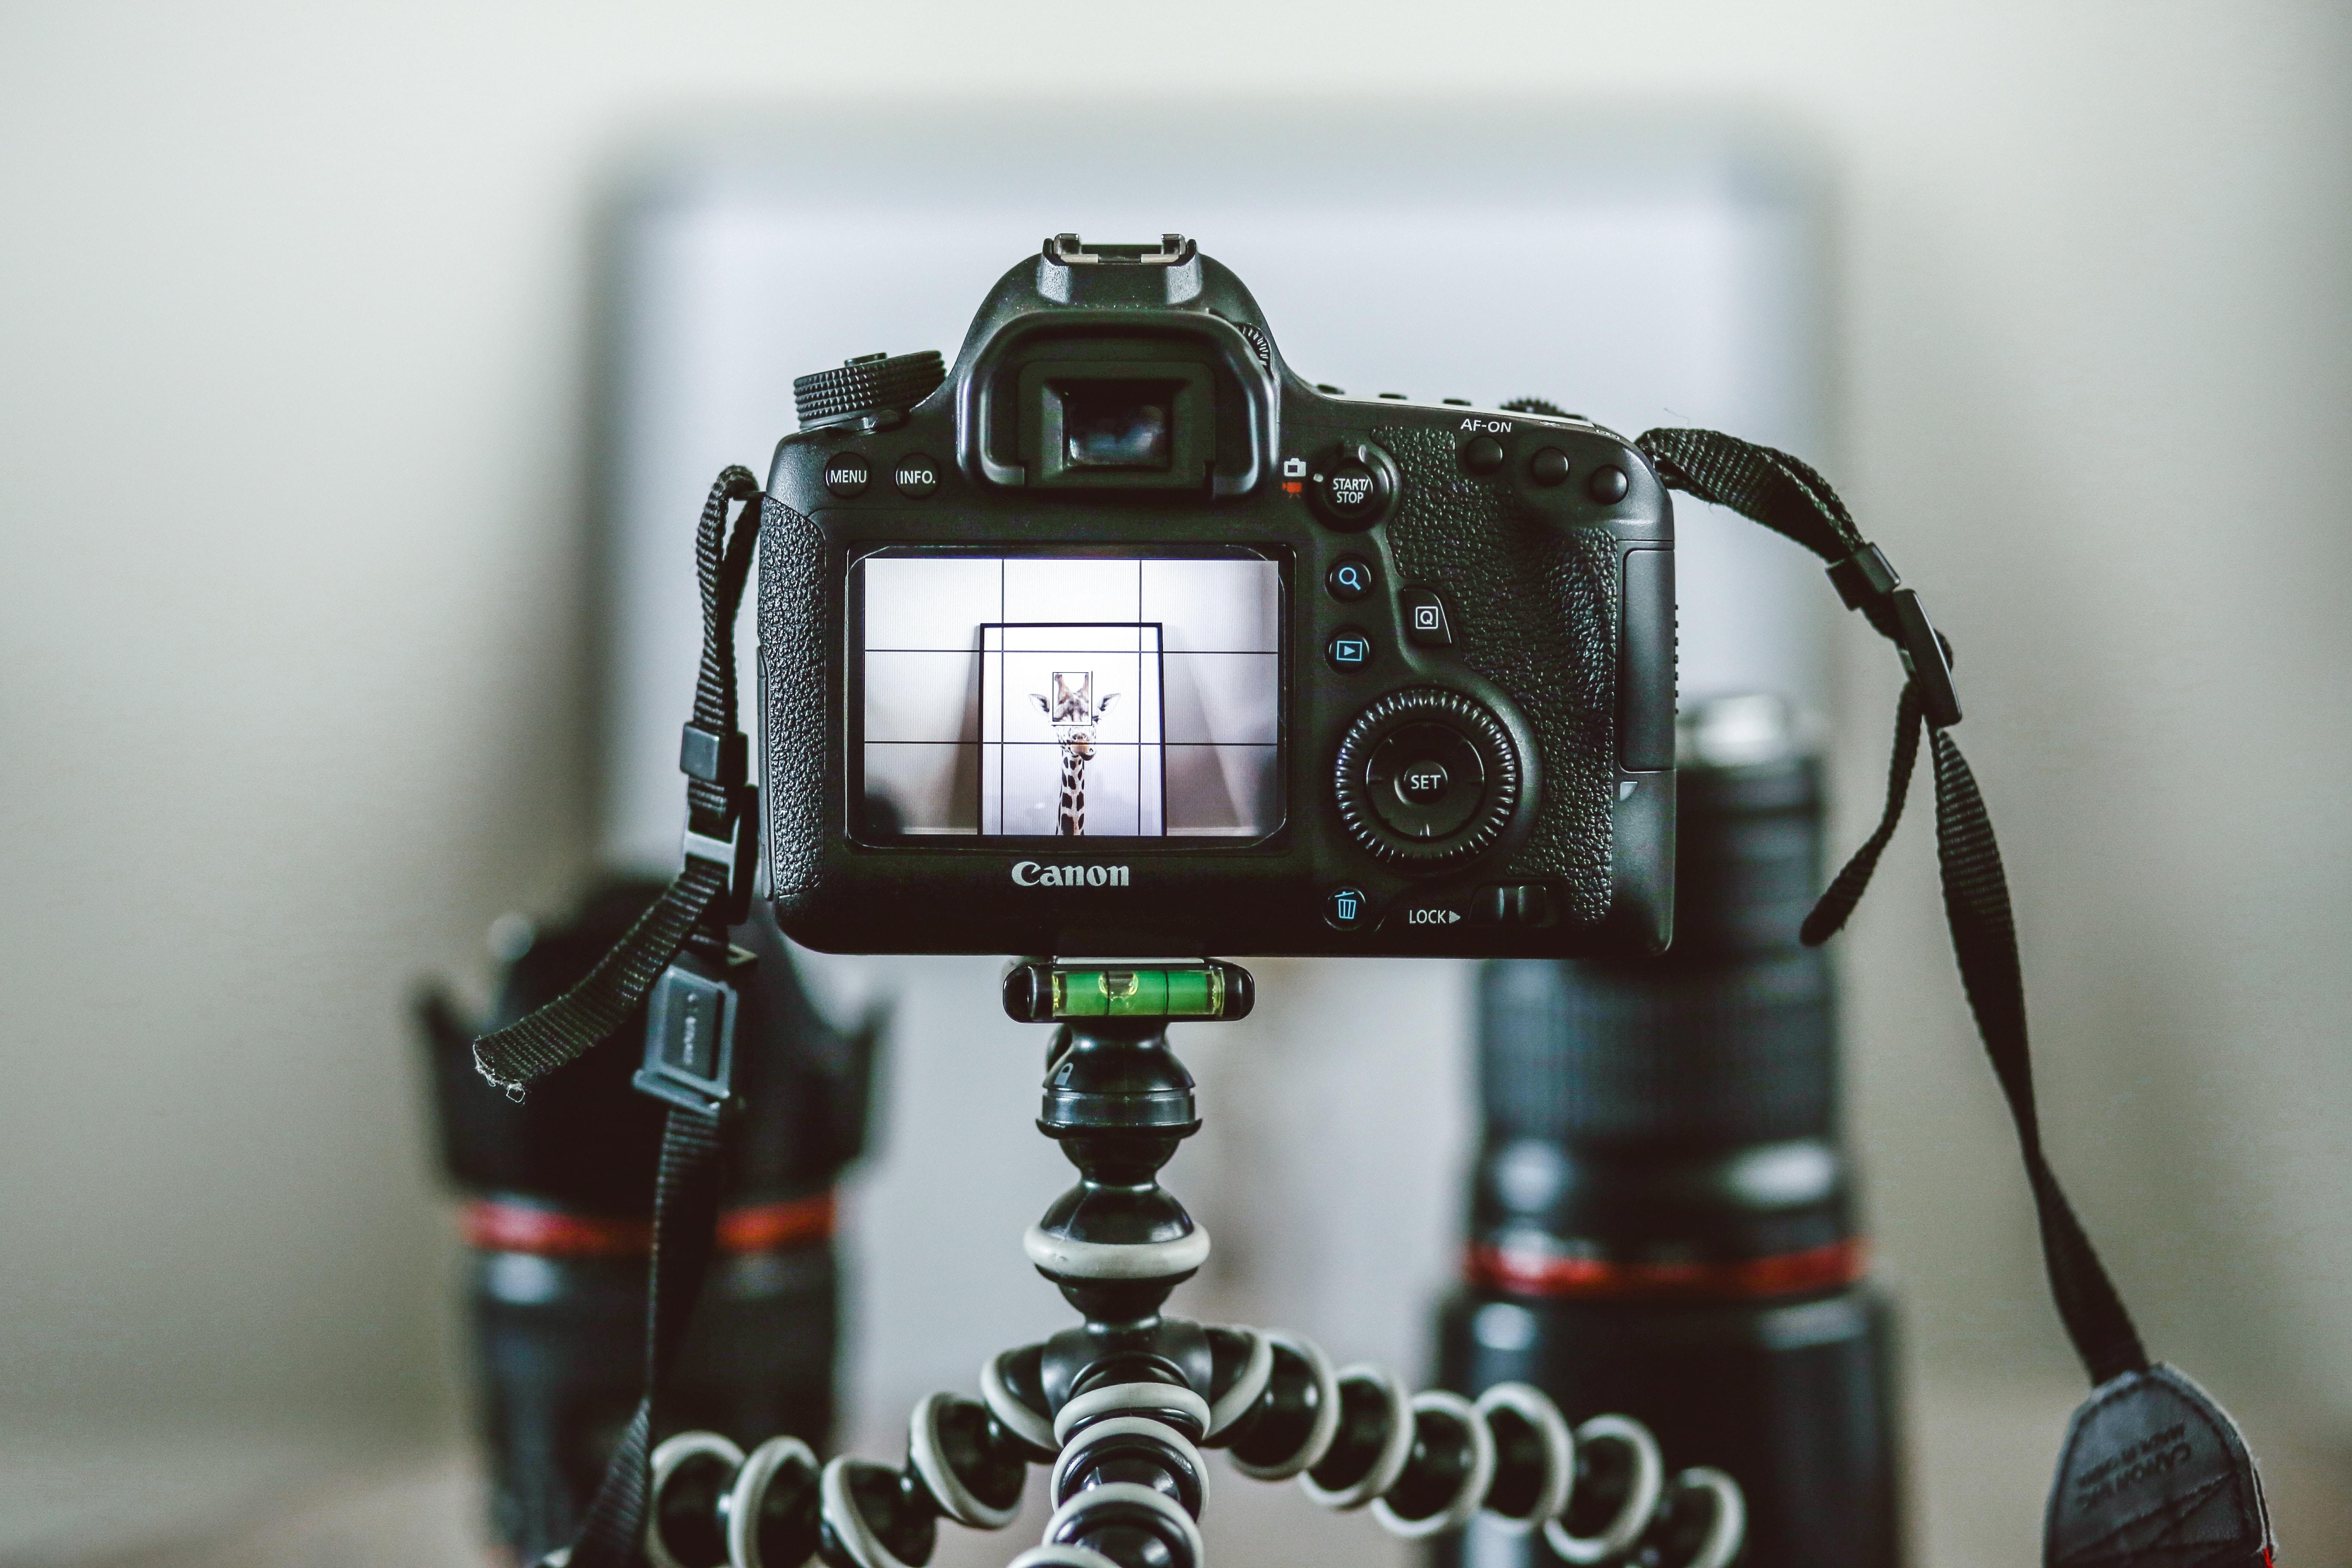 boosting video performance||social media fiverr gig||fiverr social media gig||social media gig||fiverr video seo gig||fiverr video seo gig||video seo Gig||boosting video performance